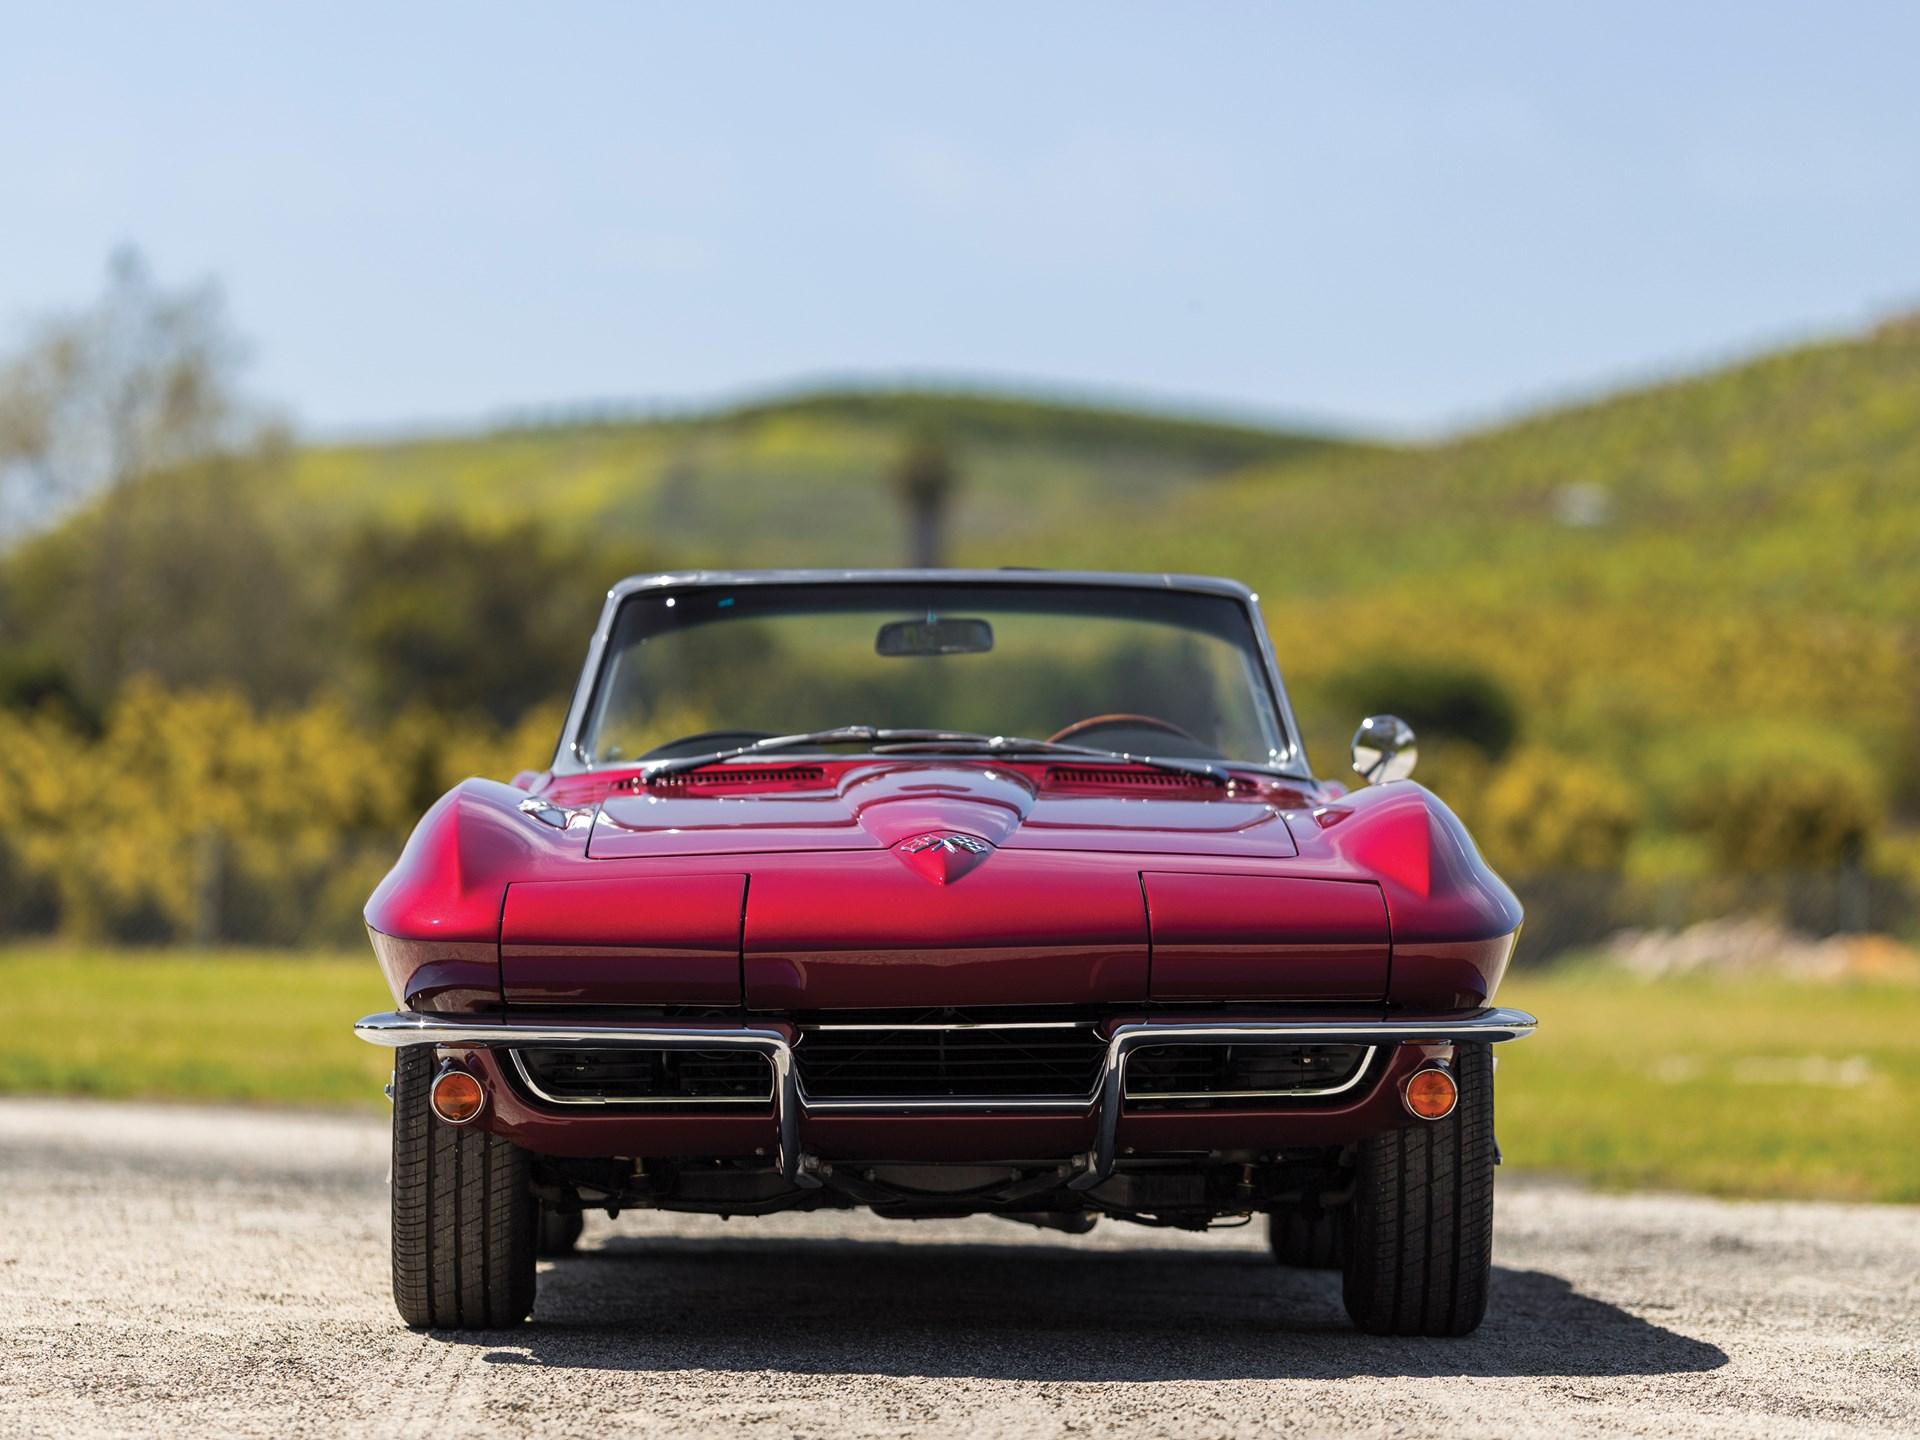 1965 Chevrolet Corvette Sting Ray Convertible